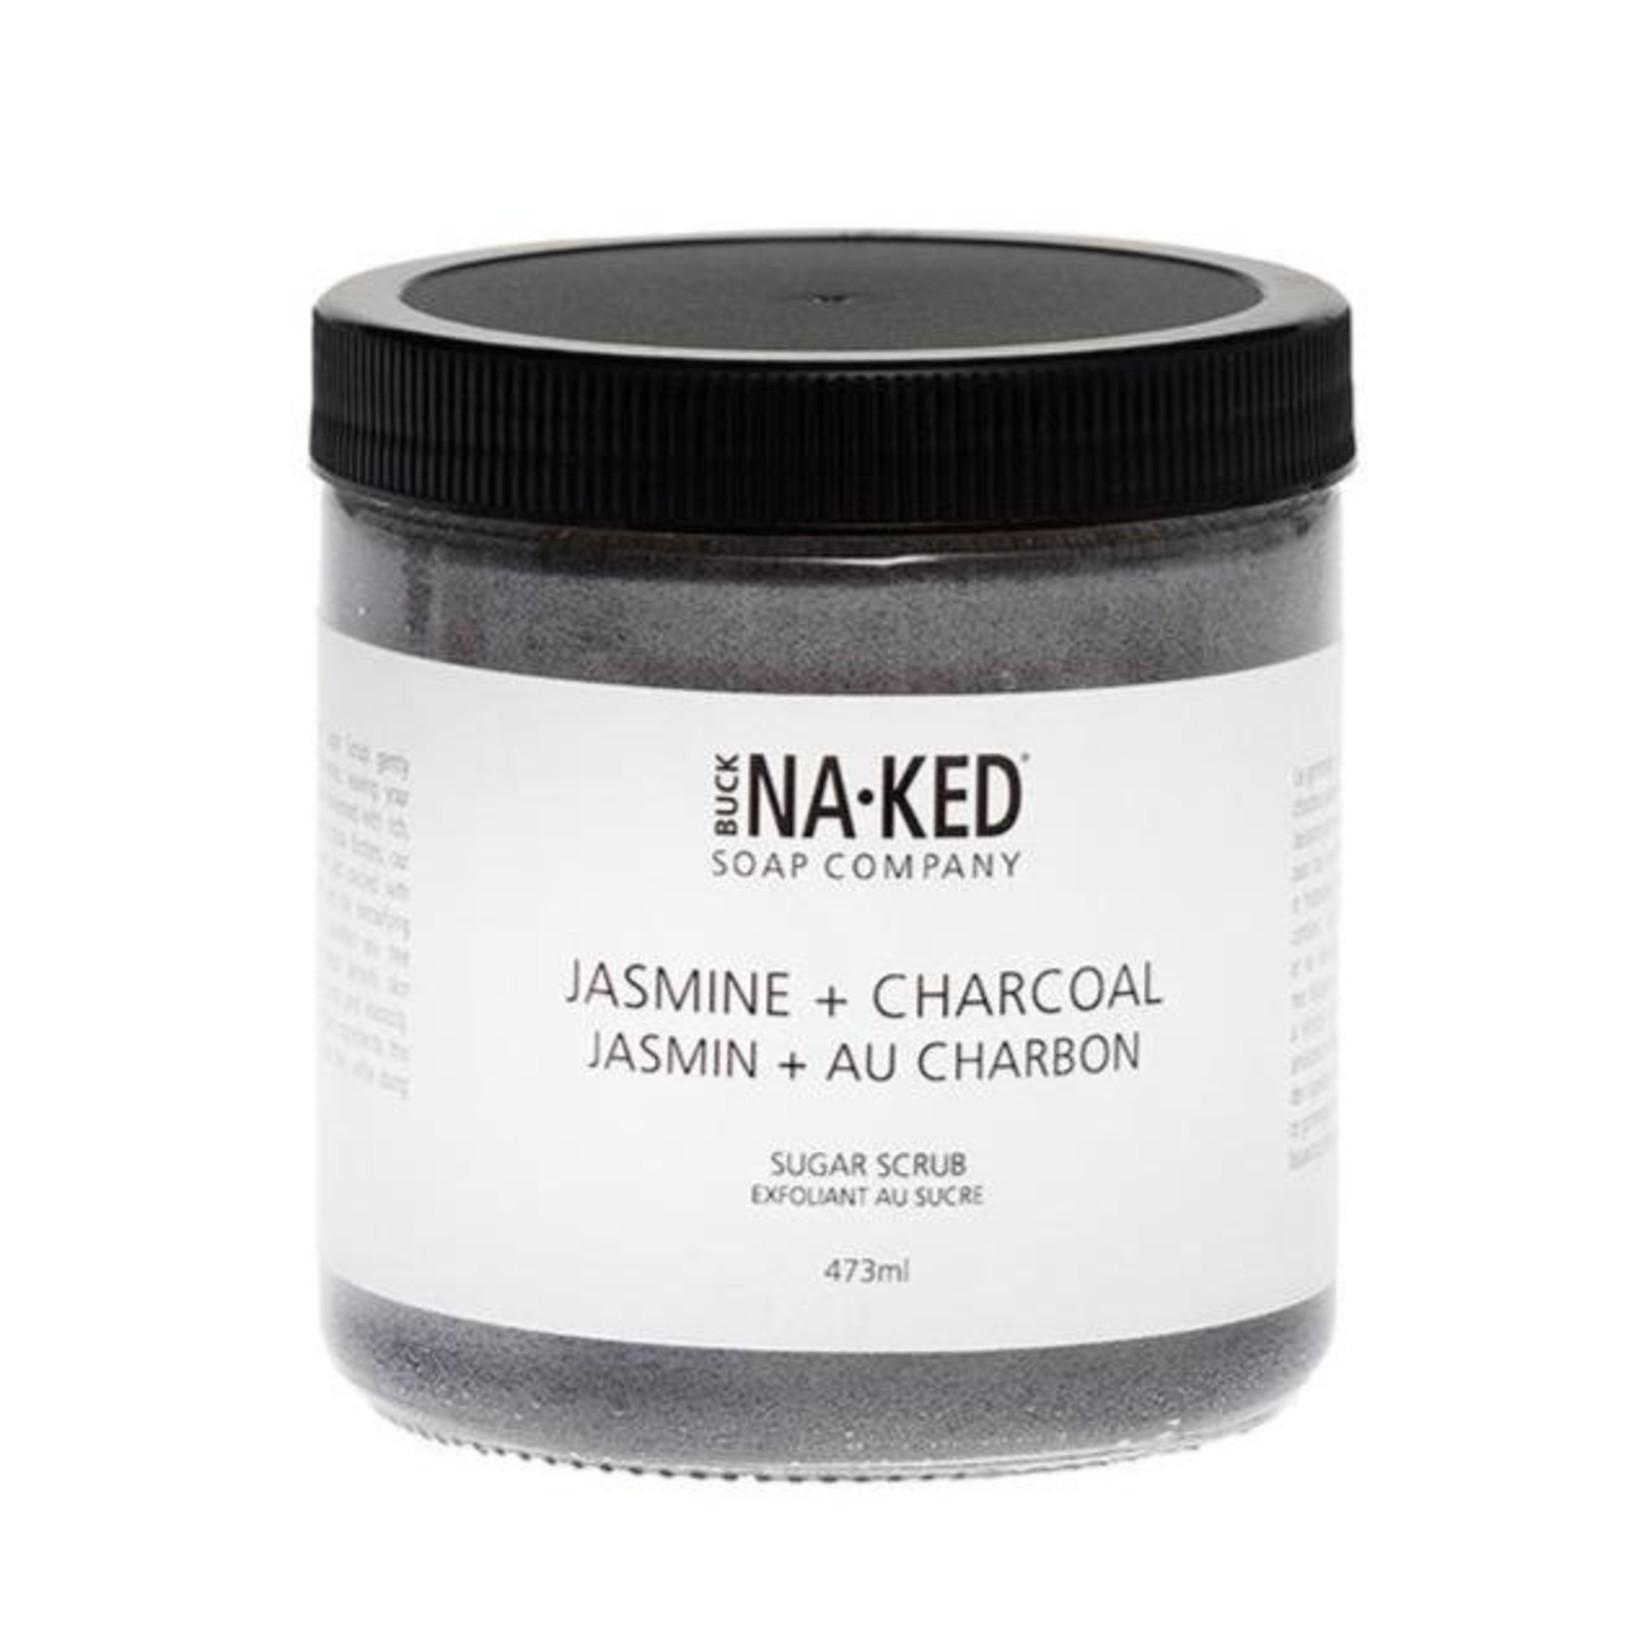 Buck Naked Soap Company Jasmine and Charcoal Sugar Scrub